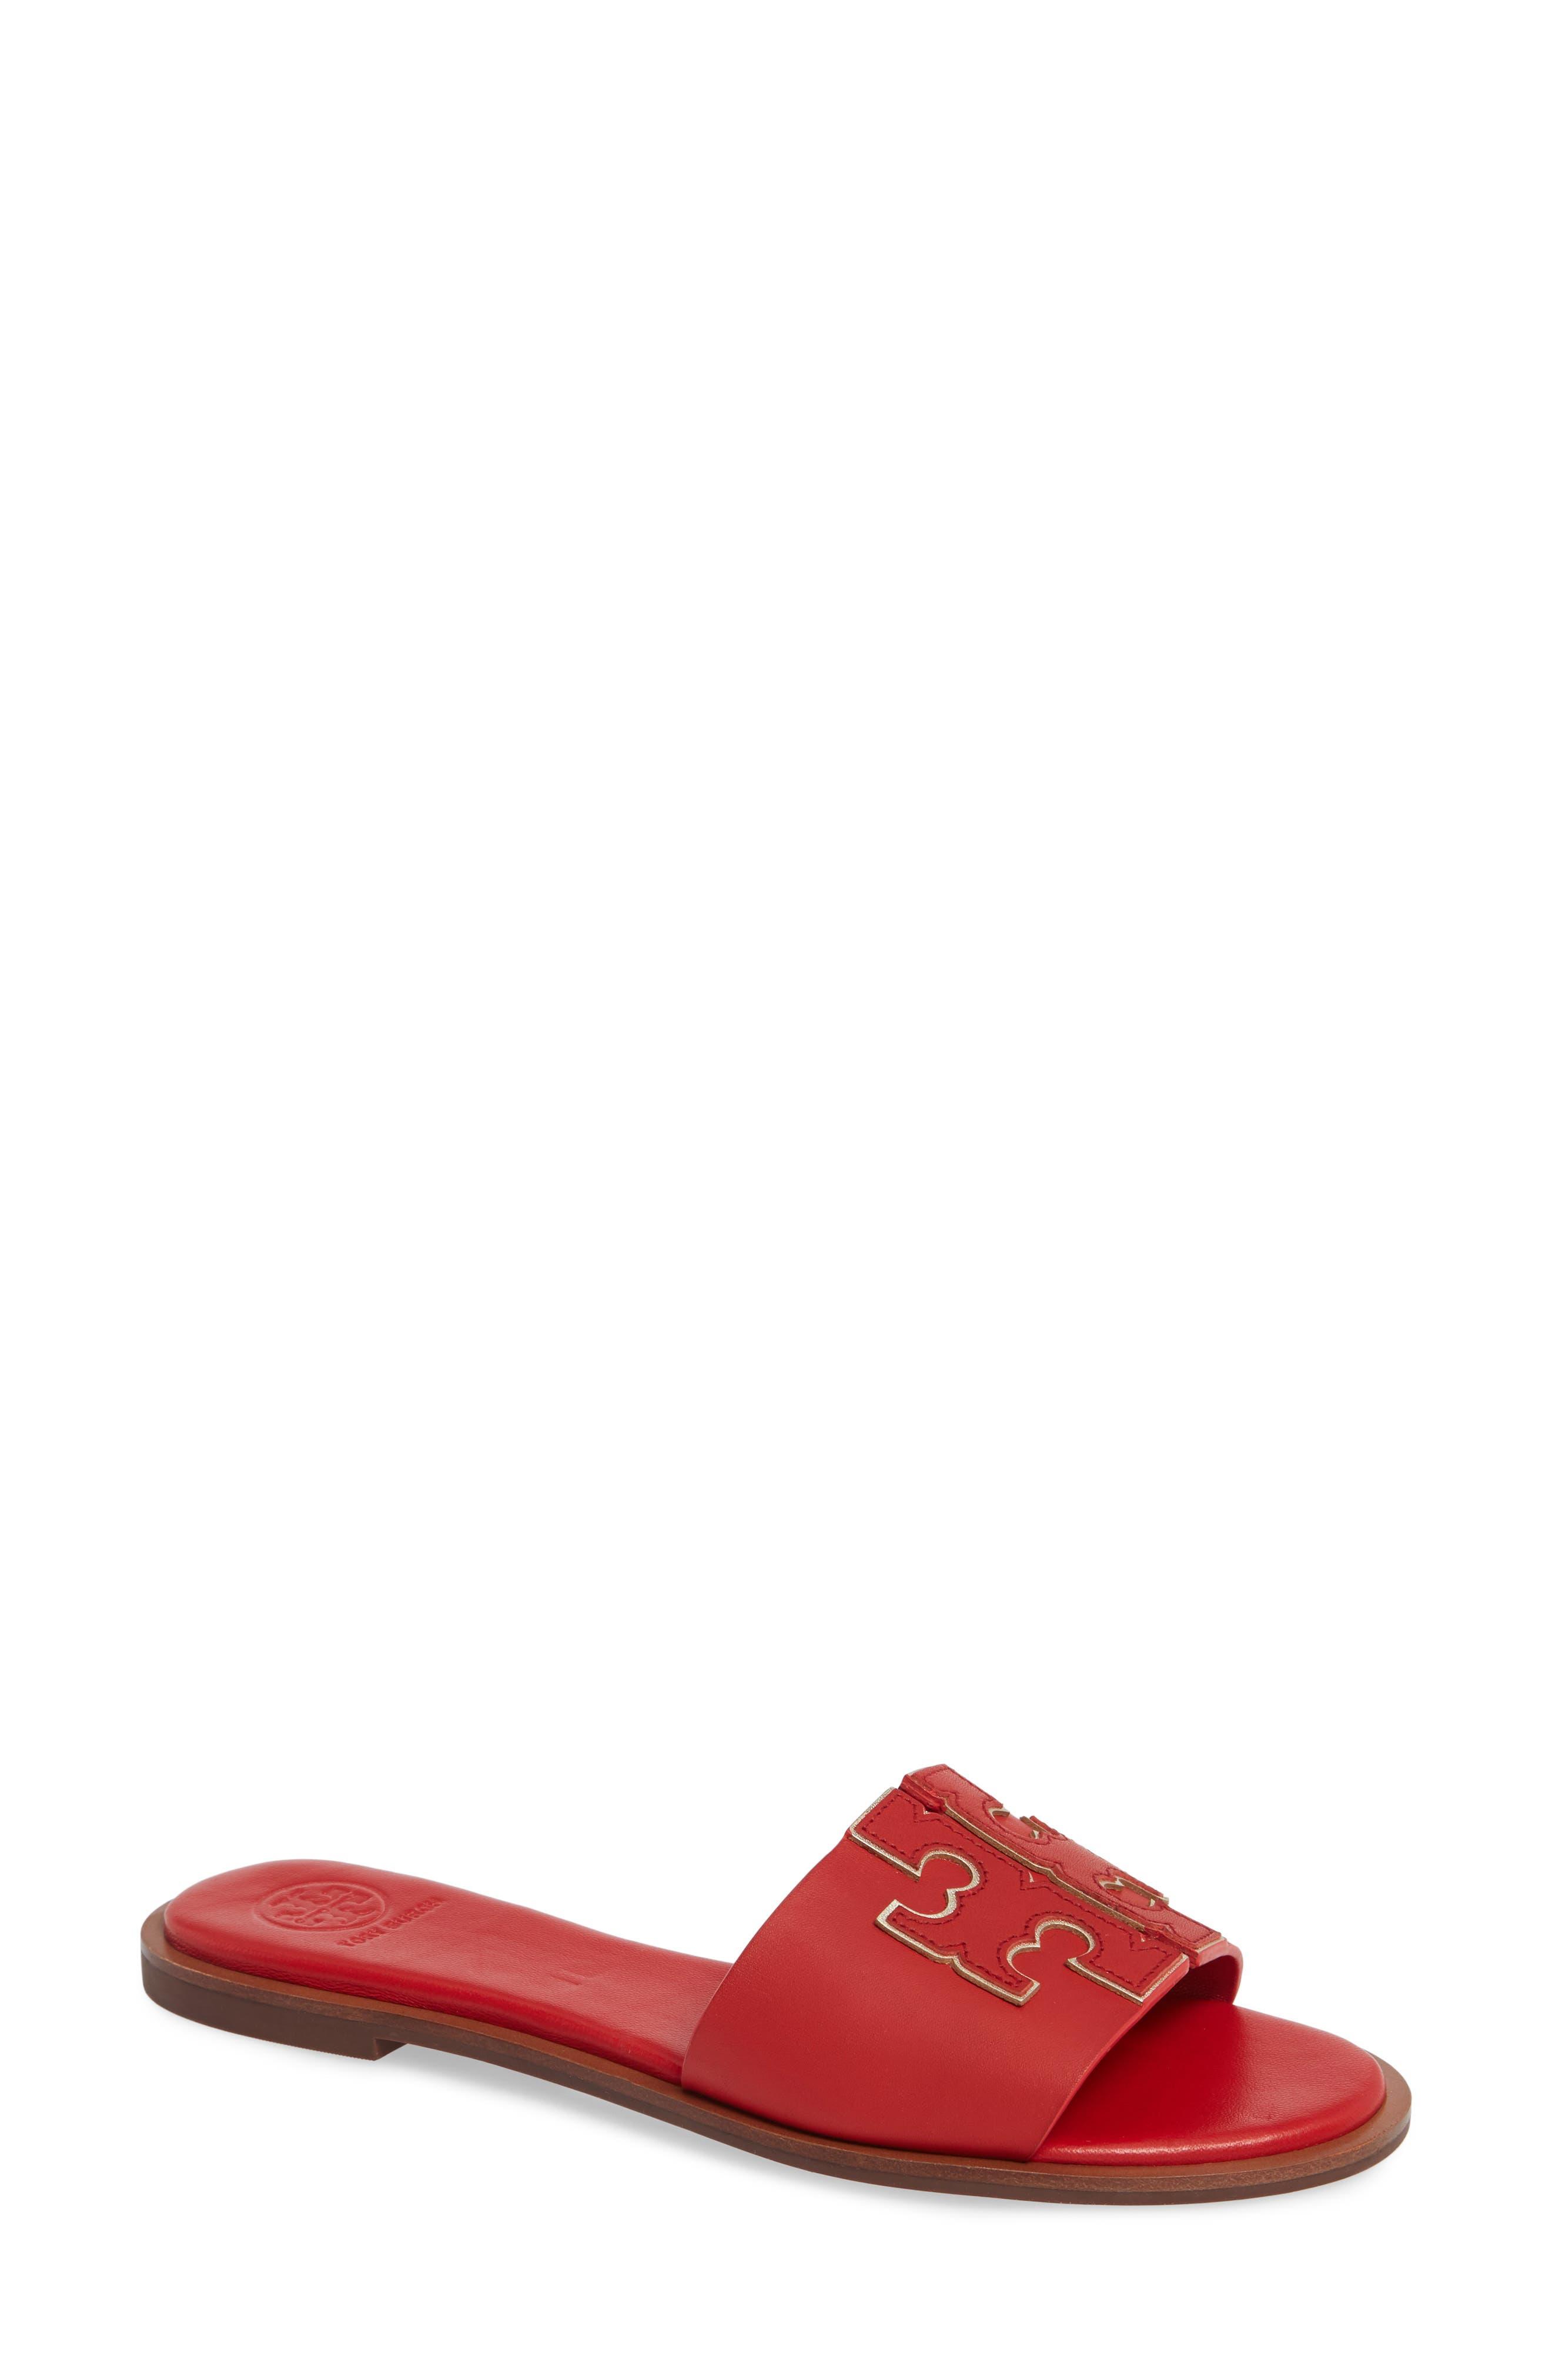 Tory Burch Ines Slide Sandal, Red